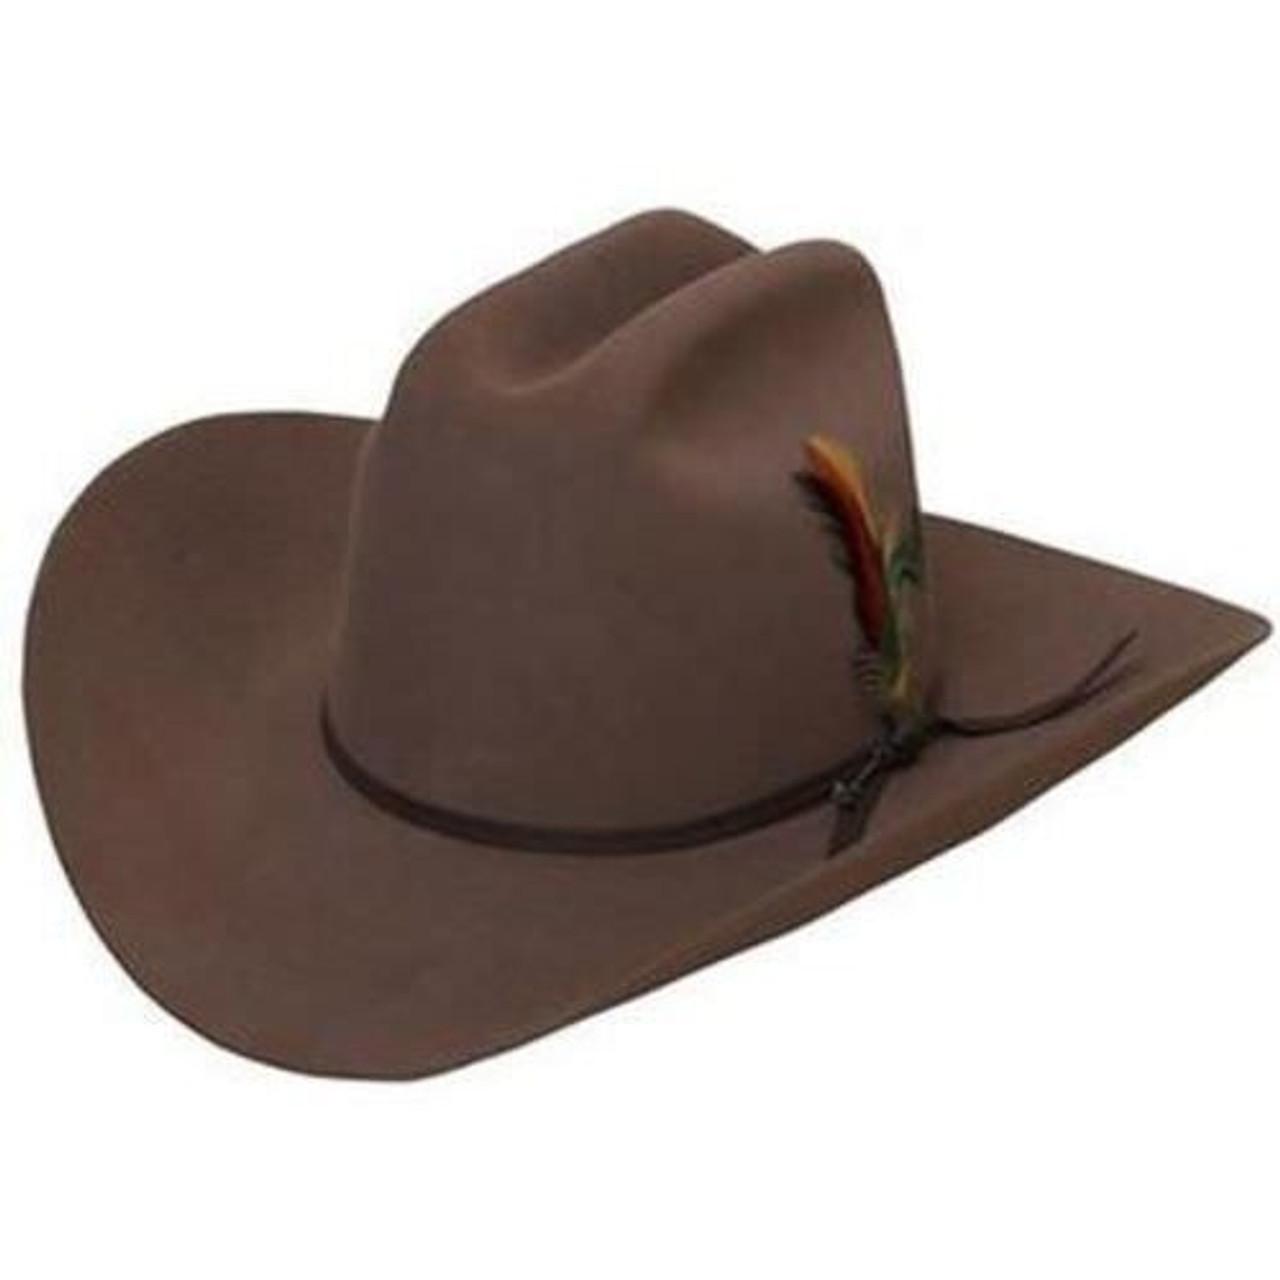 a7063a81c Stetson Hats - Rancher 6x Classic Collection Felt